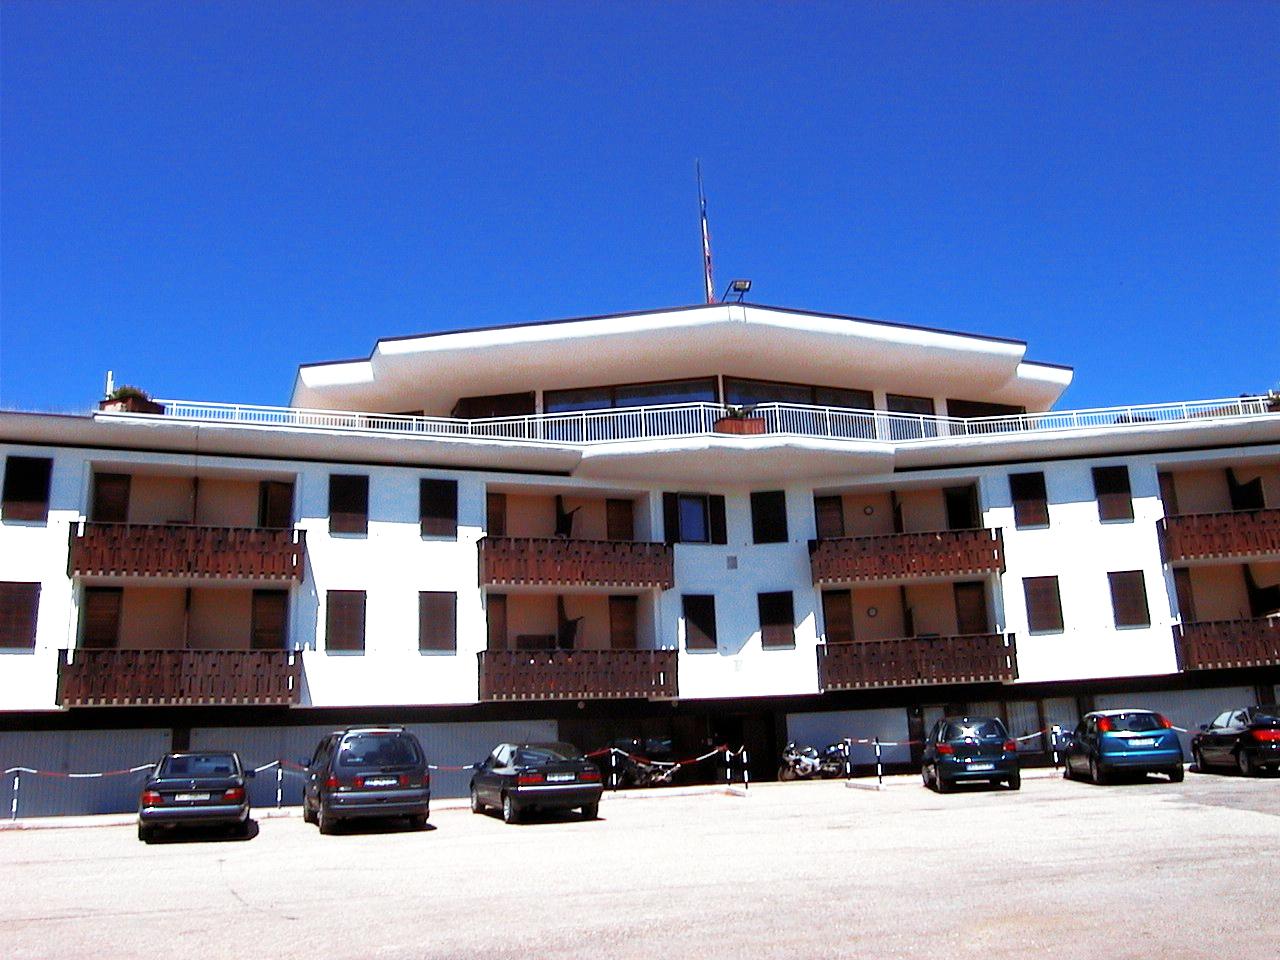 Hotel Seis - Referenze